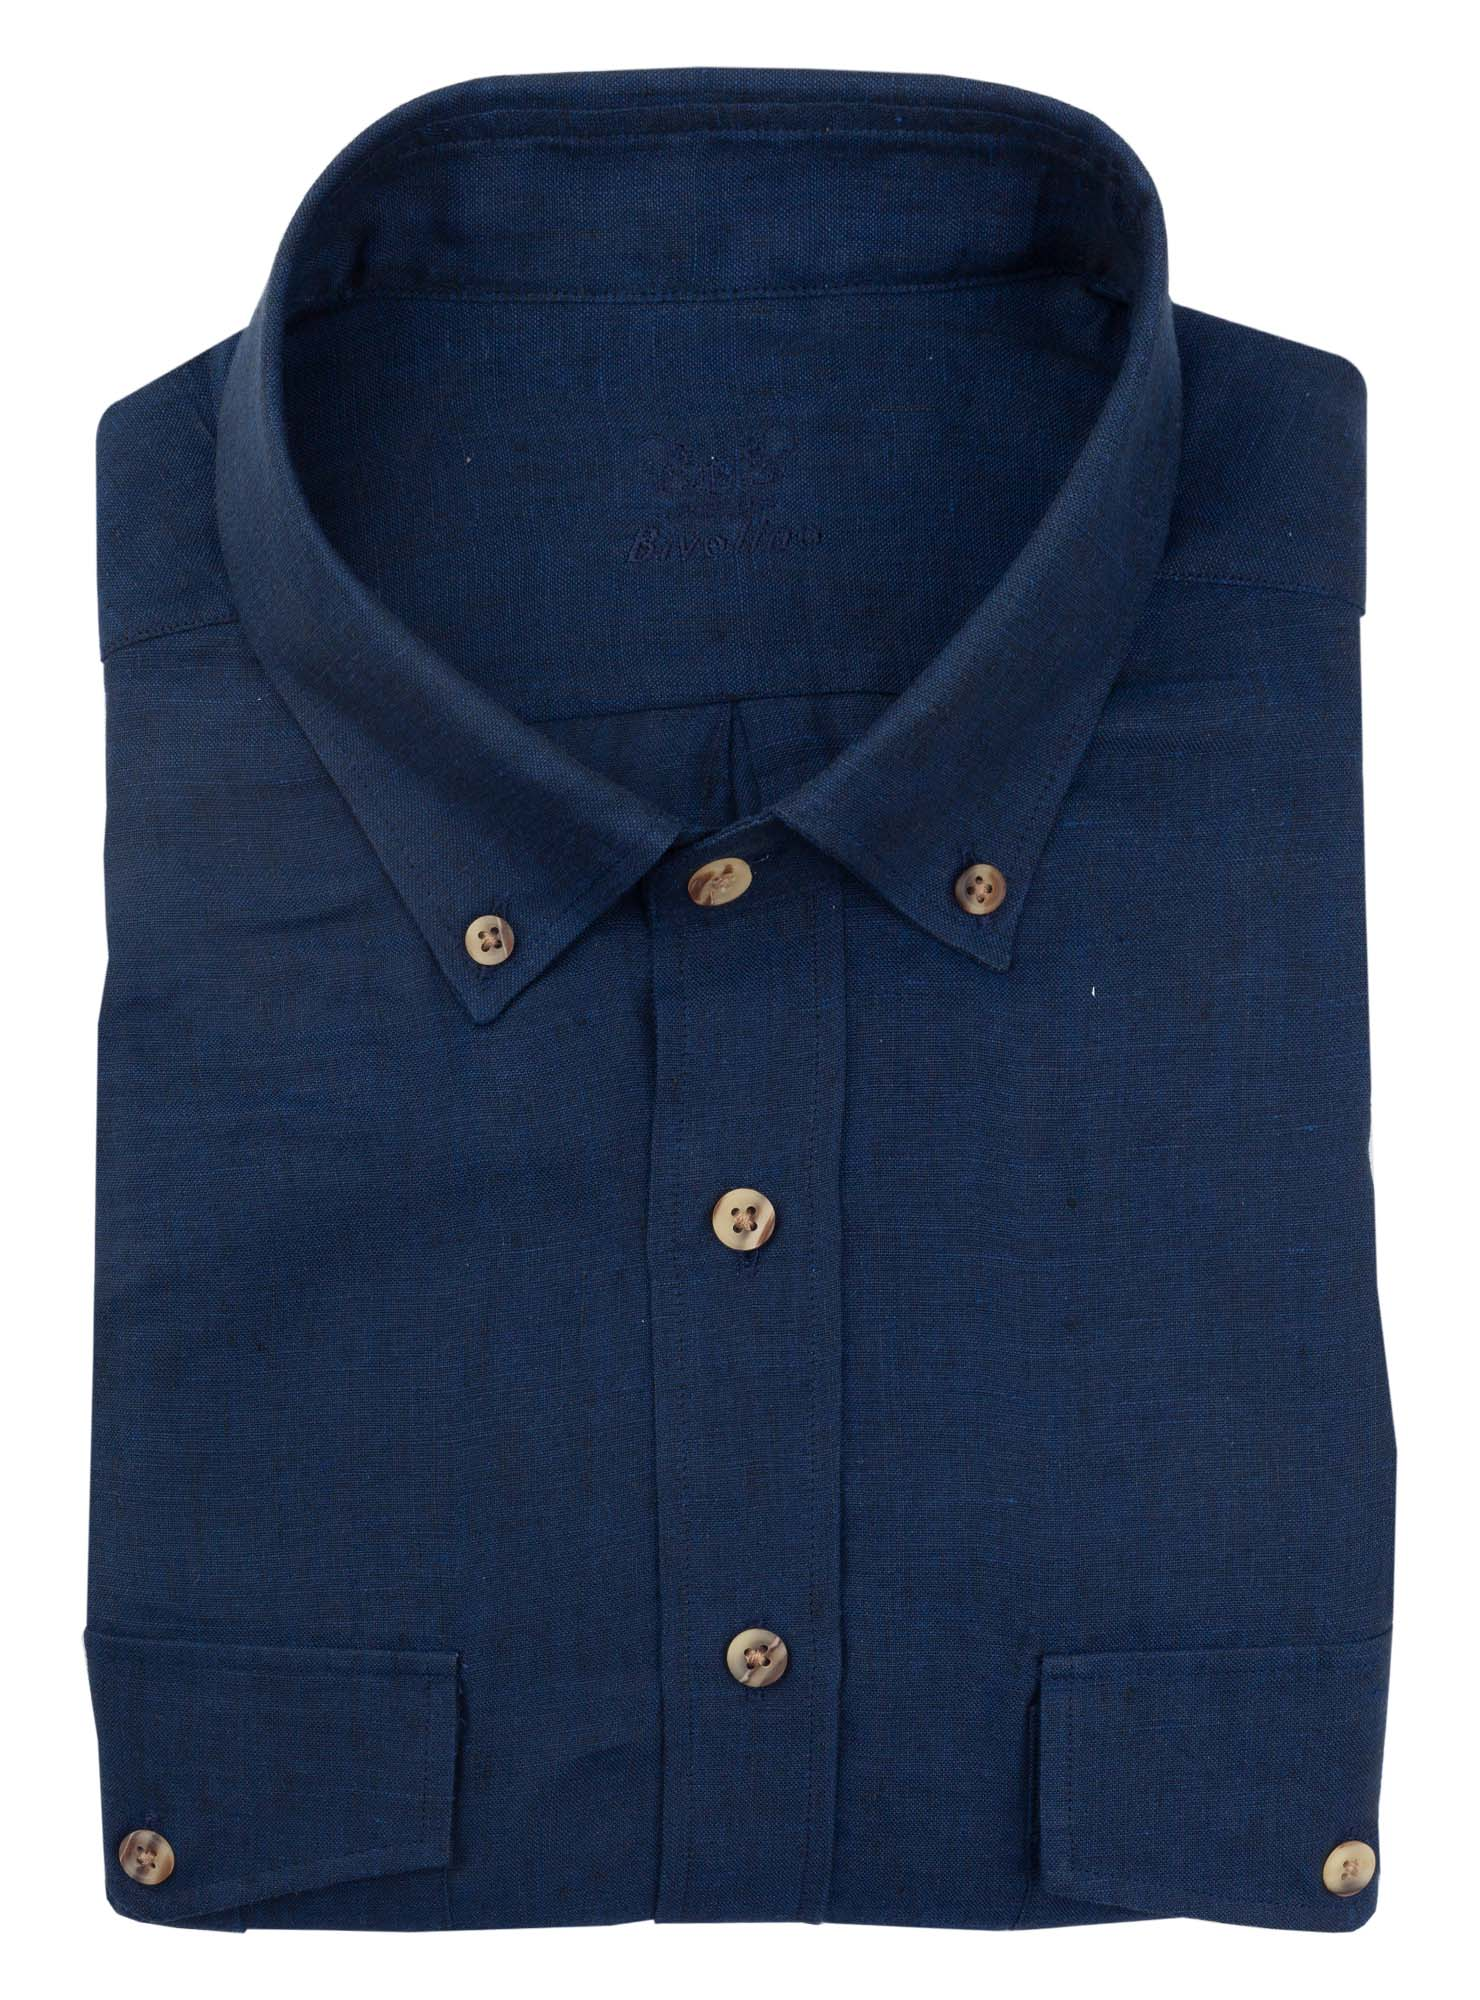 SERINI - smart casual linen navy shirt - Sera 3